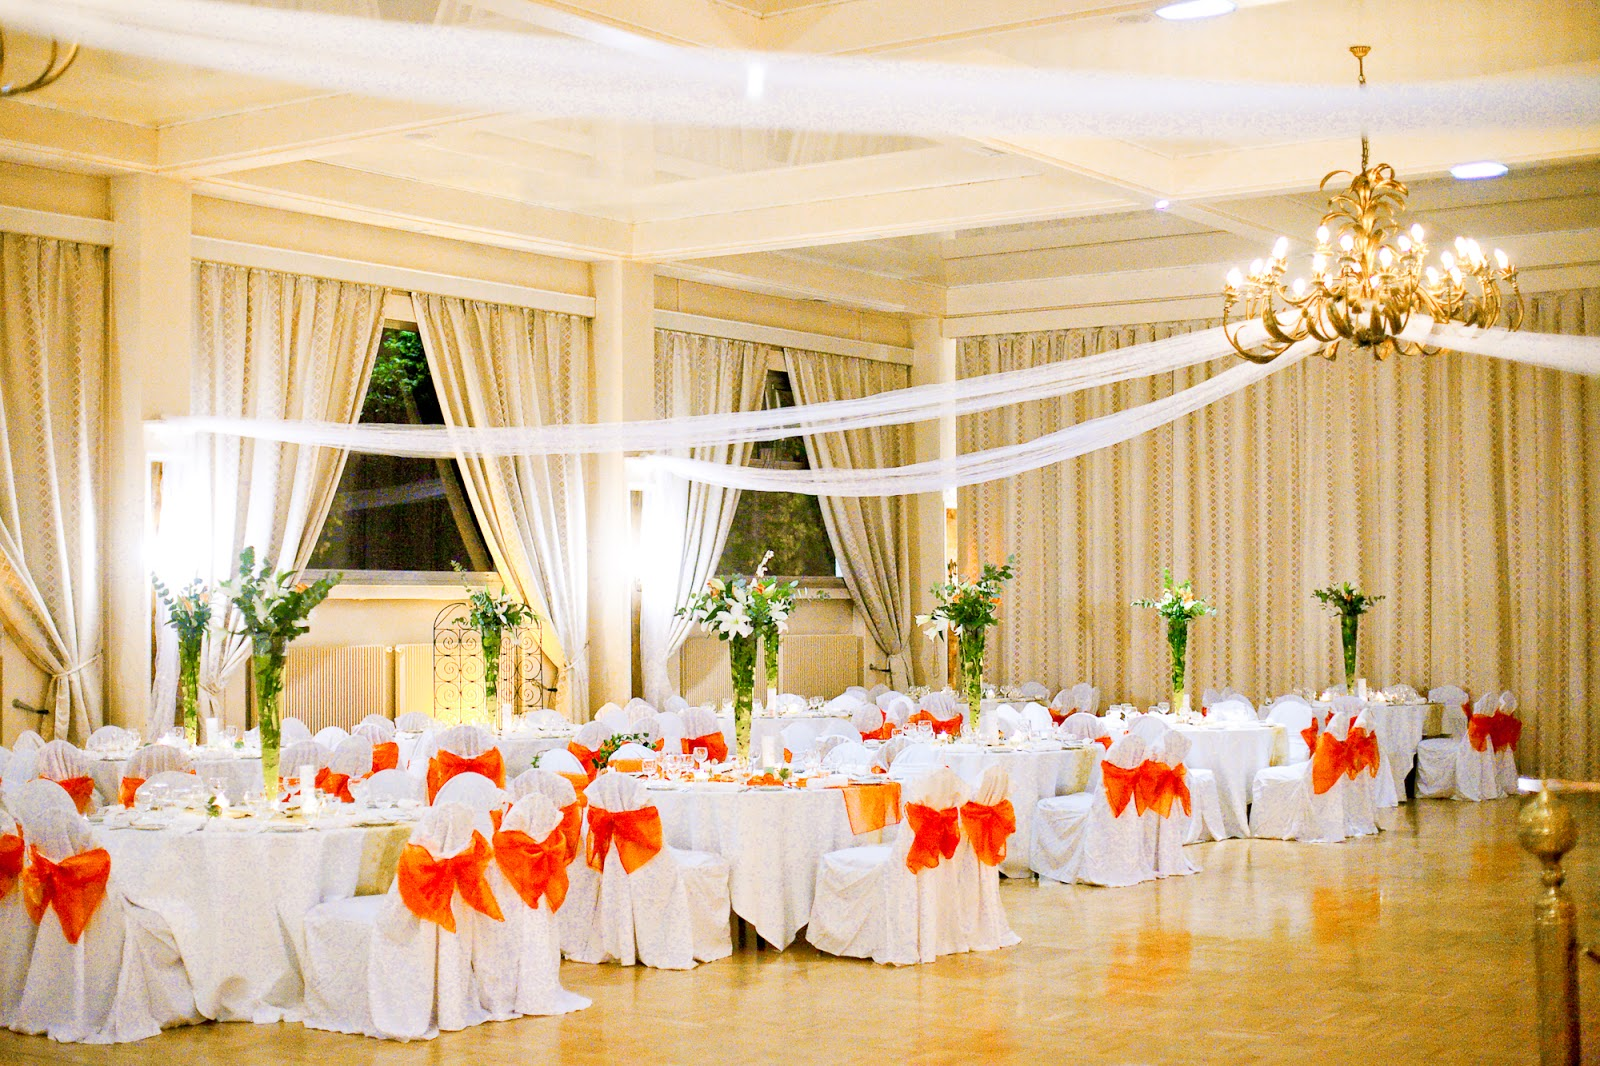 decoration salle mariage romantique. Black Bedroom Furniture Sets. Home Design Ideas